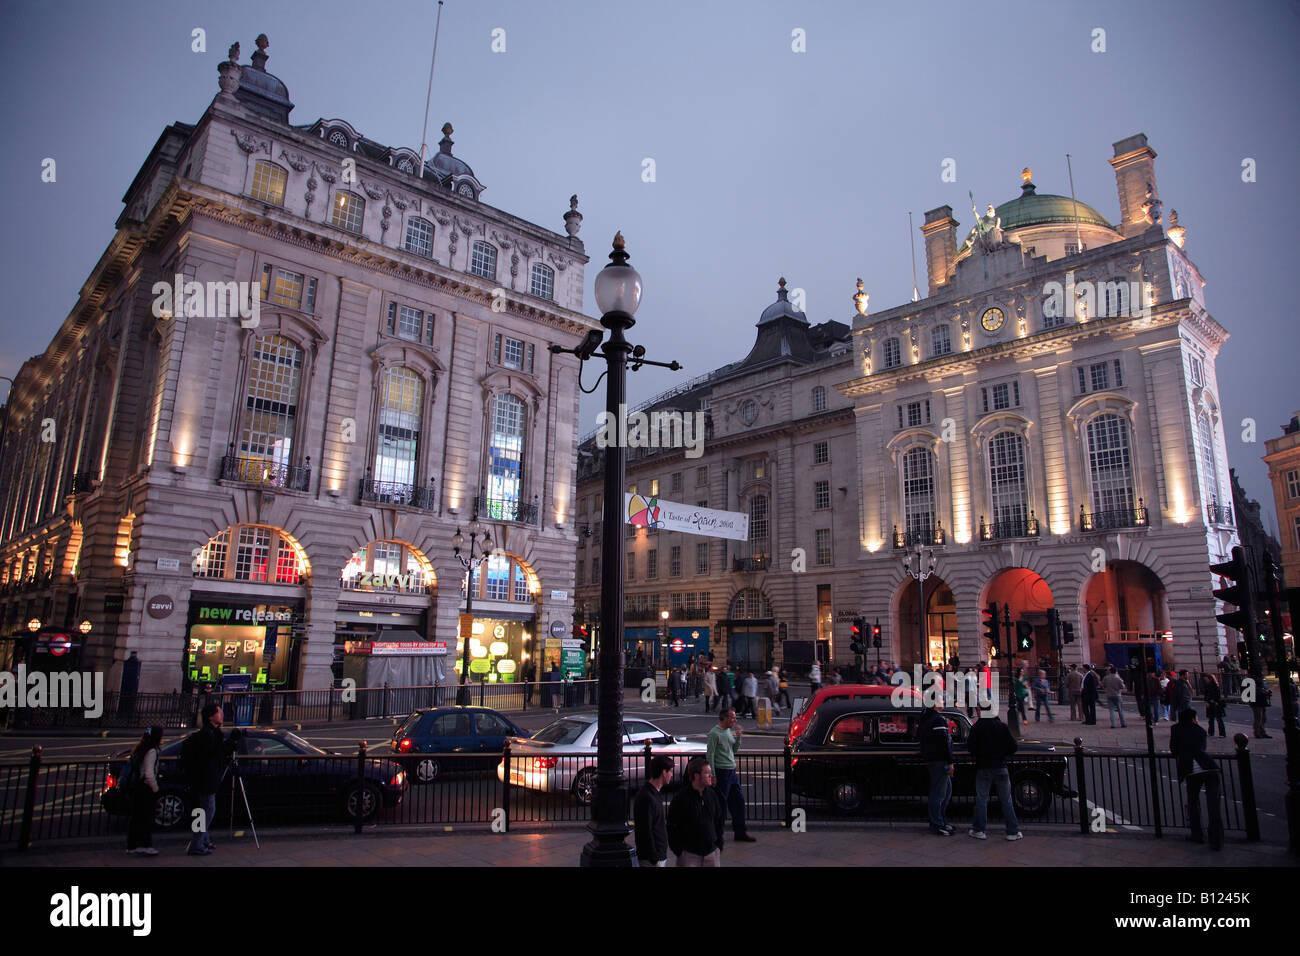 UK Britain England London Picadilly Circus - Stock Image